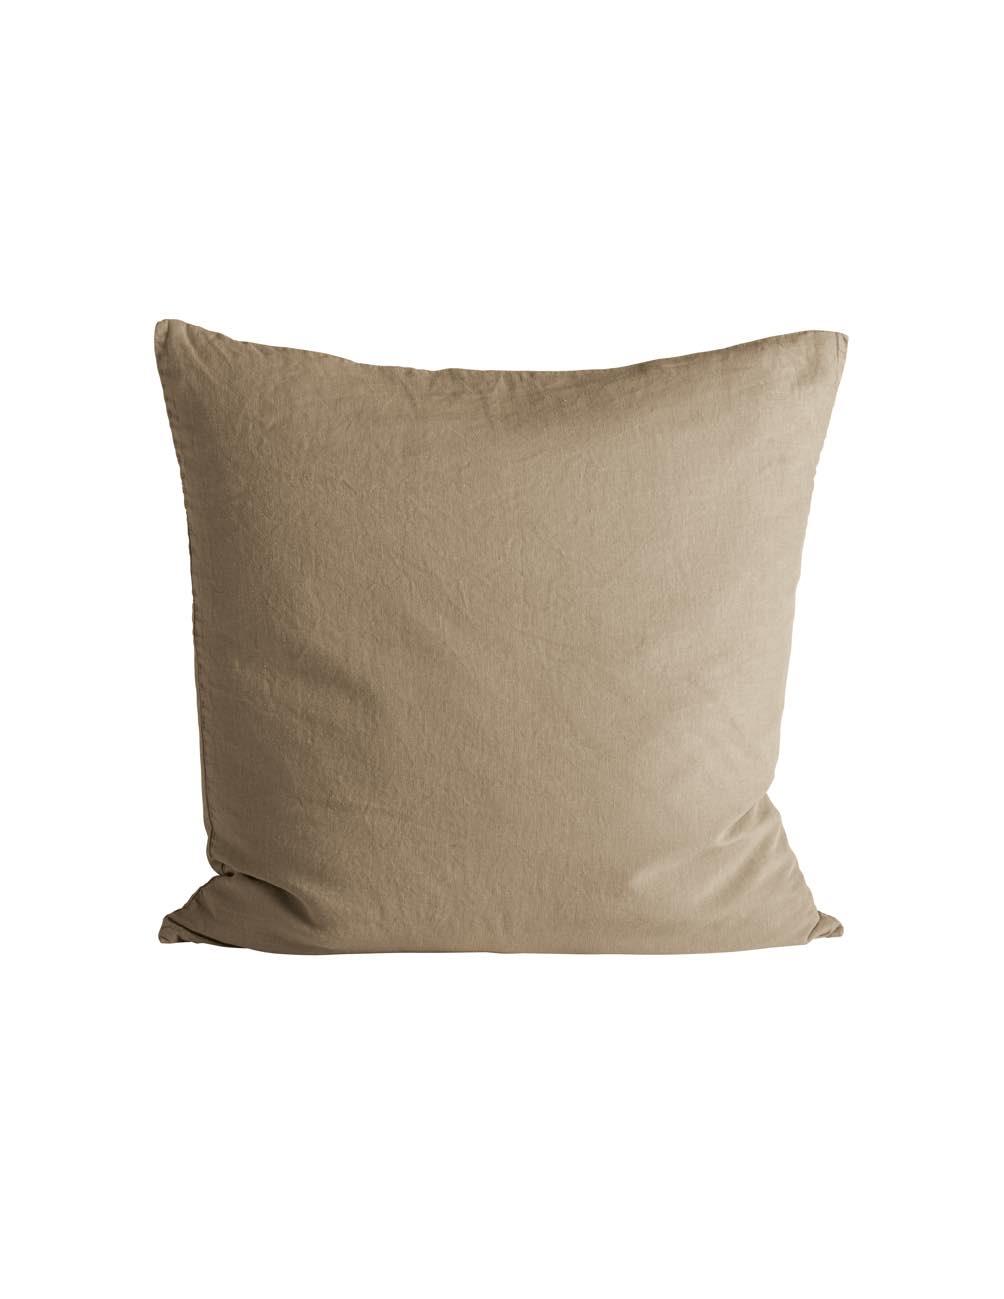 Honey Linen Cushion cover 50x50cm